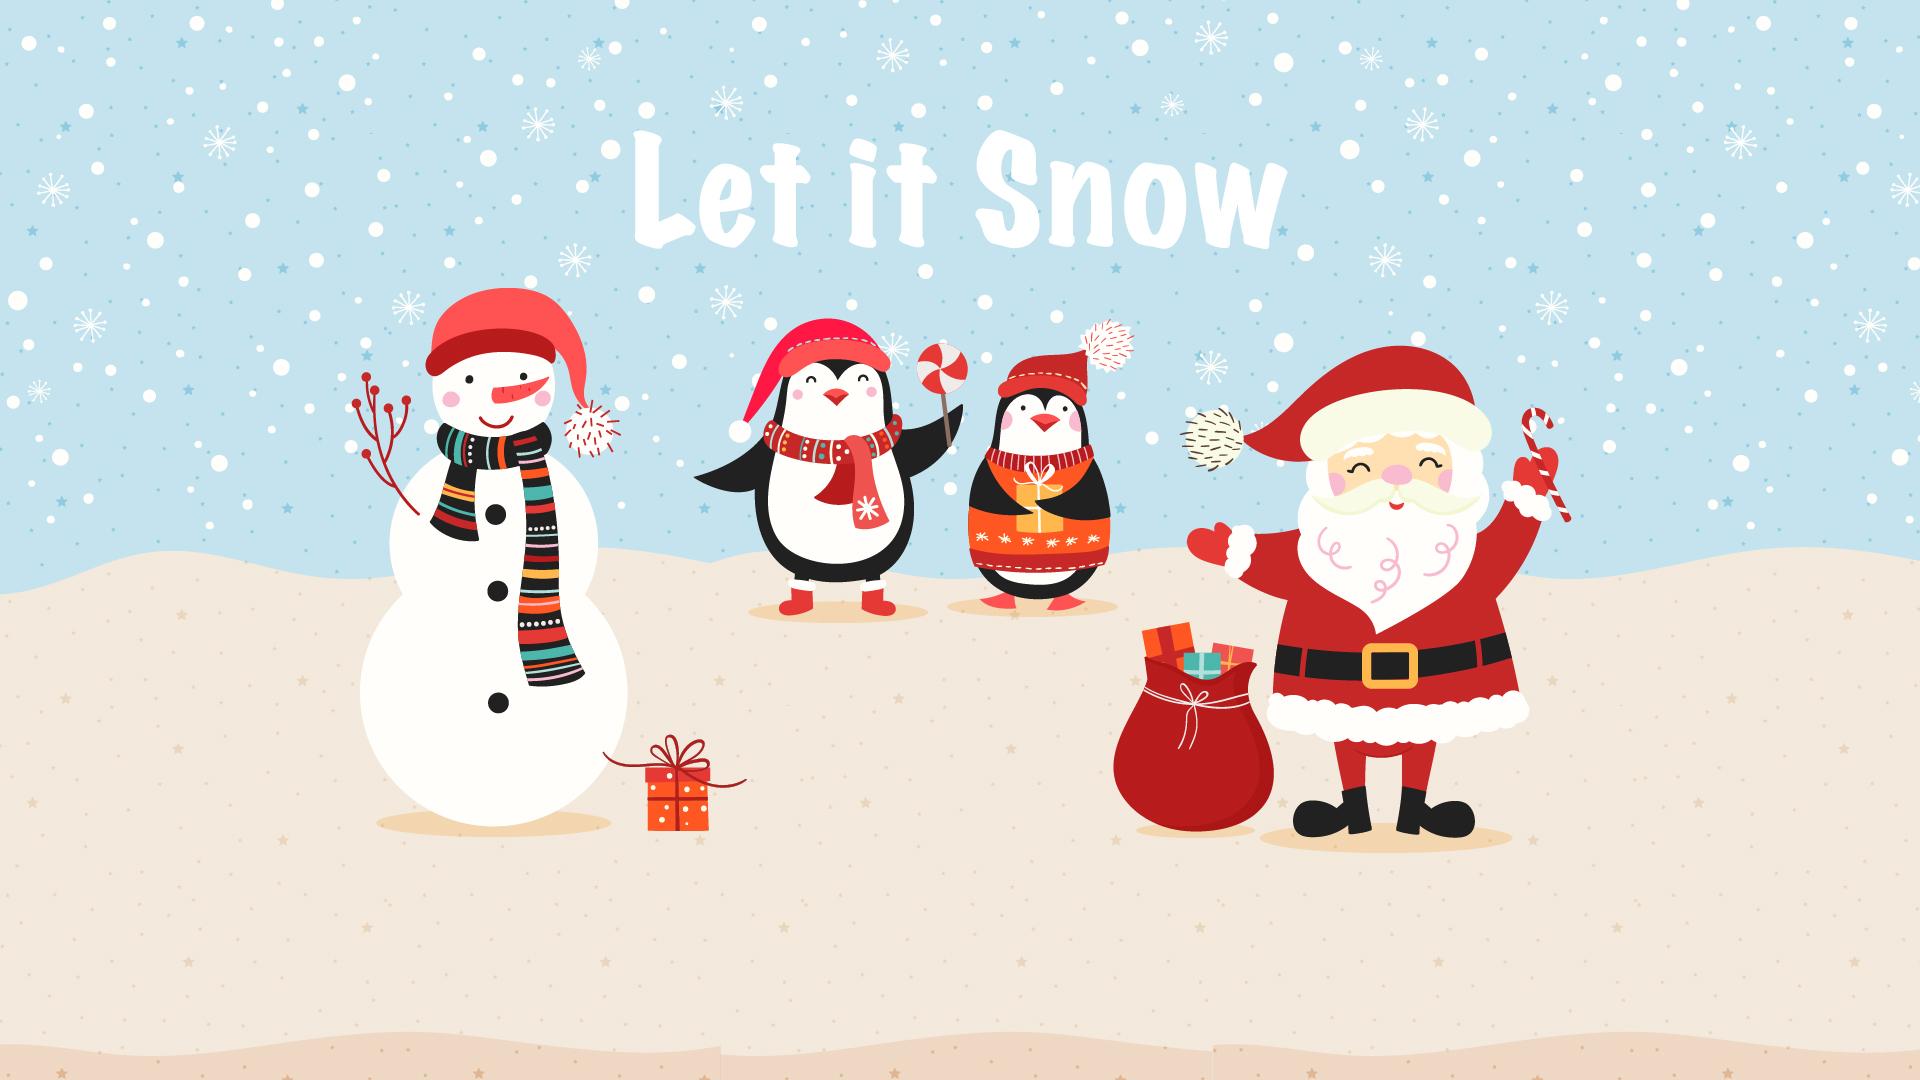 Christmas Wallpaper - Let it Snow - Cartoon